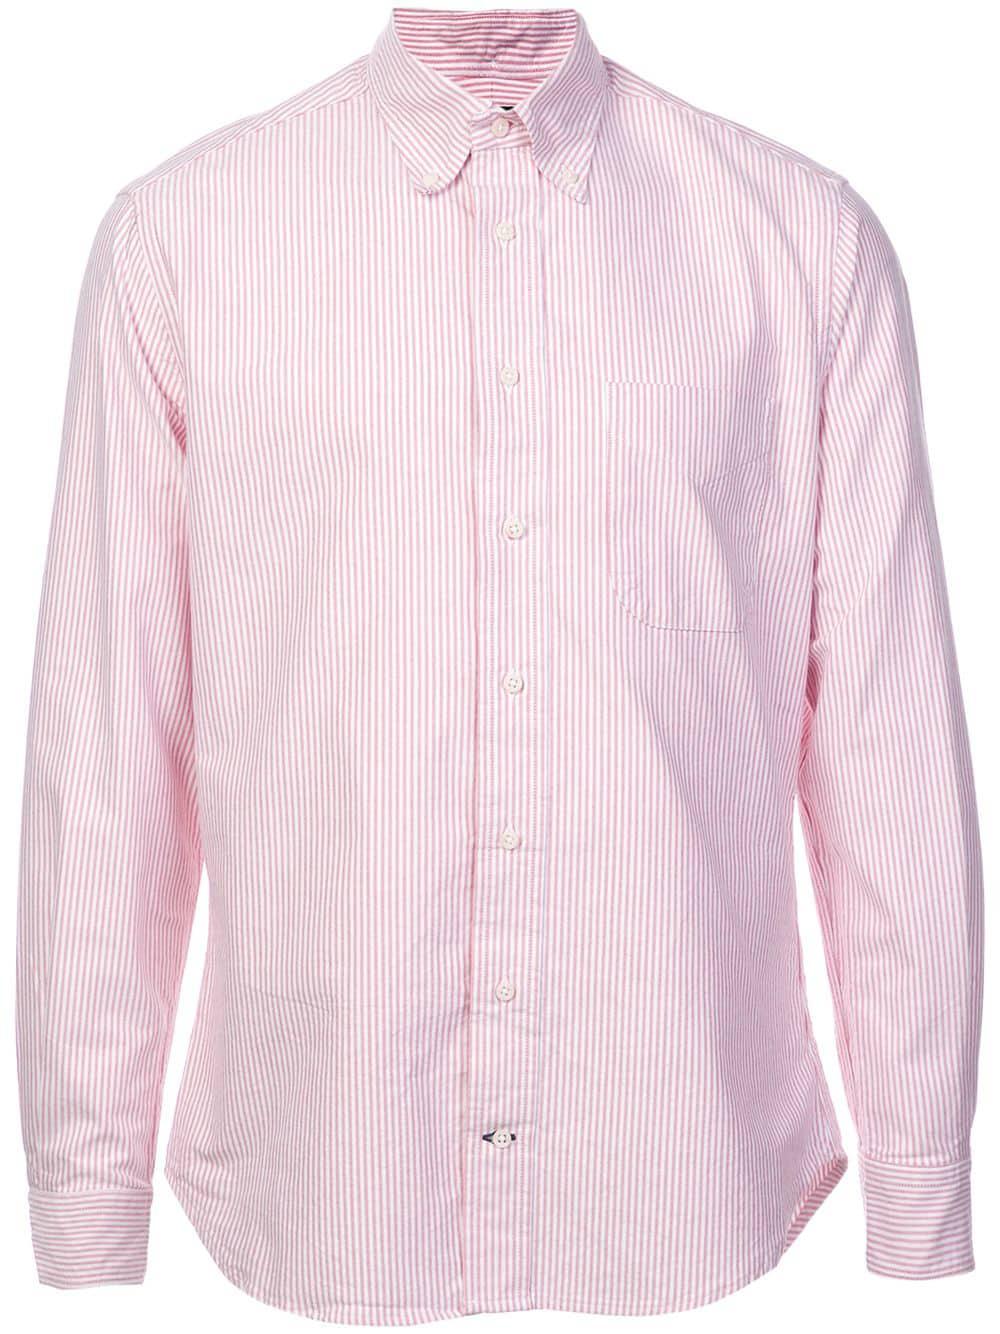 93b5aee4 Gitman Vintage Gitman Pre-Owned Striped Button-Down Shirt - Pink ...